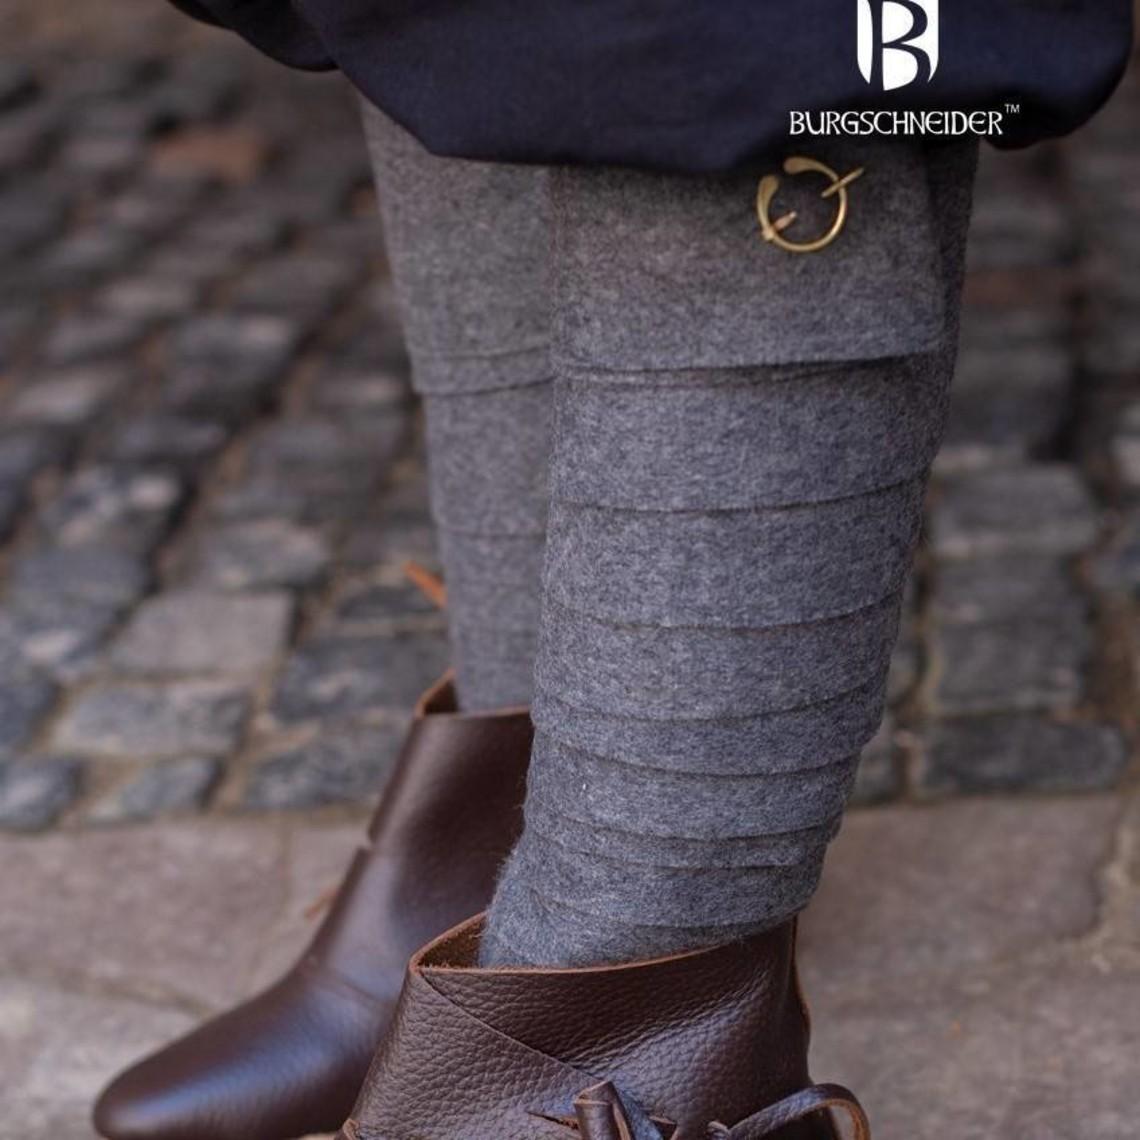 Burgschneider Envolturas para piernas Aki, gris oscuro